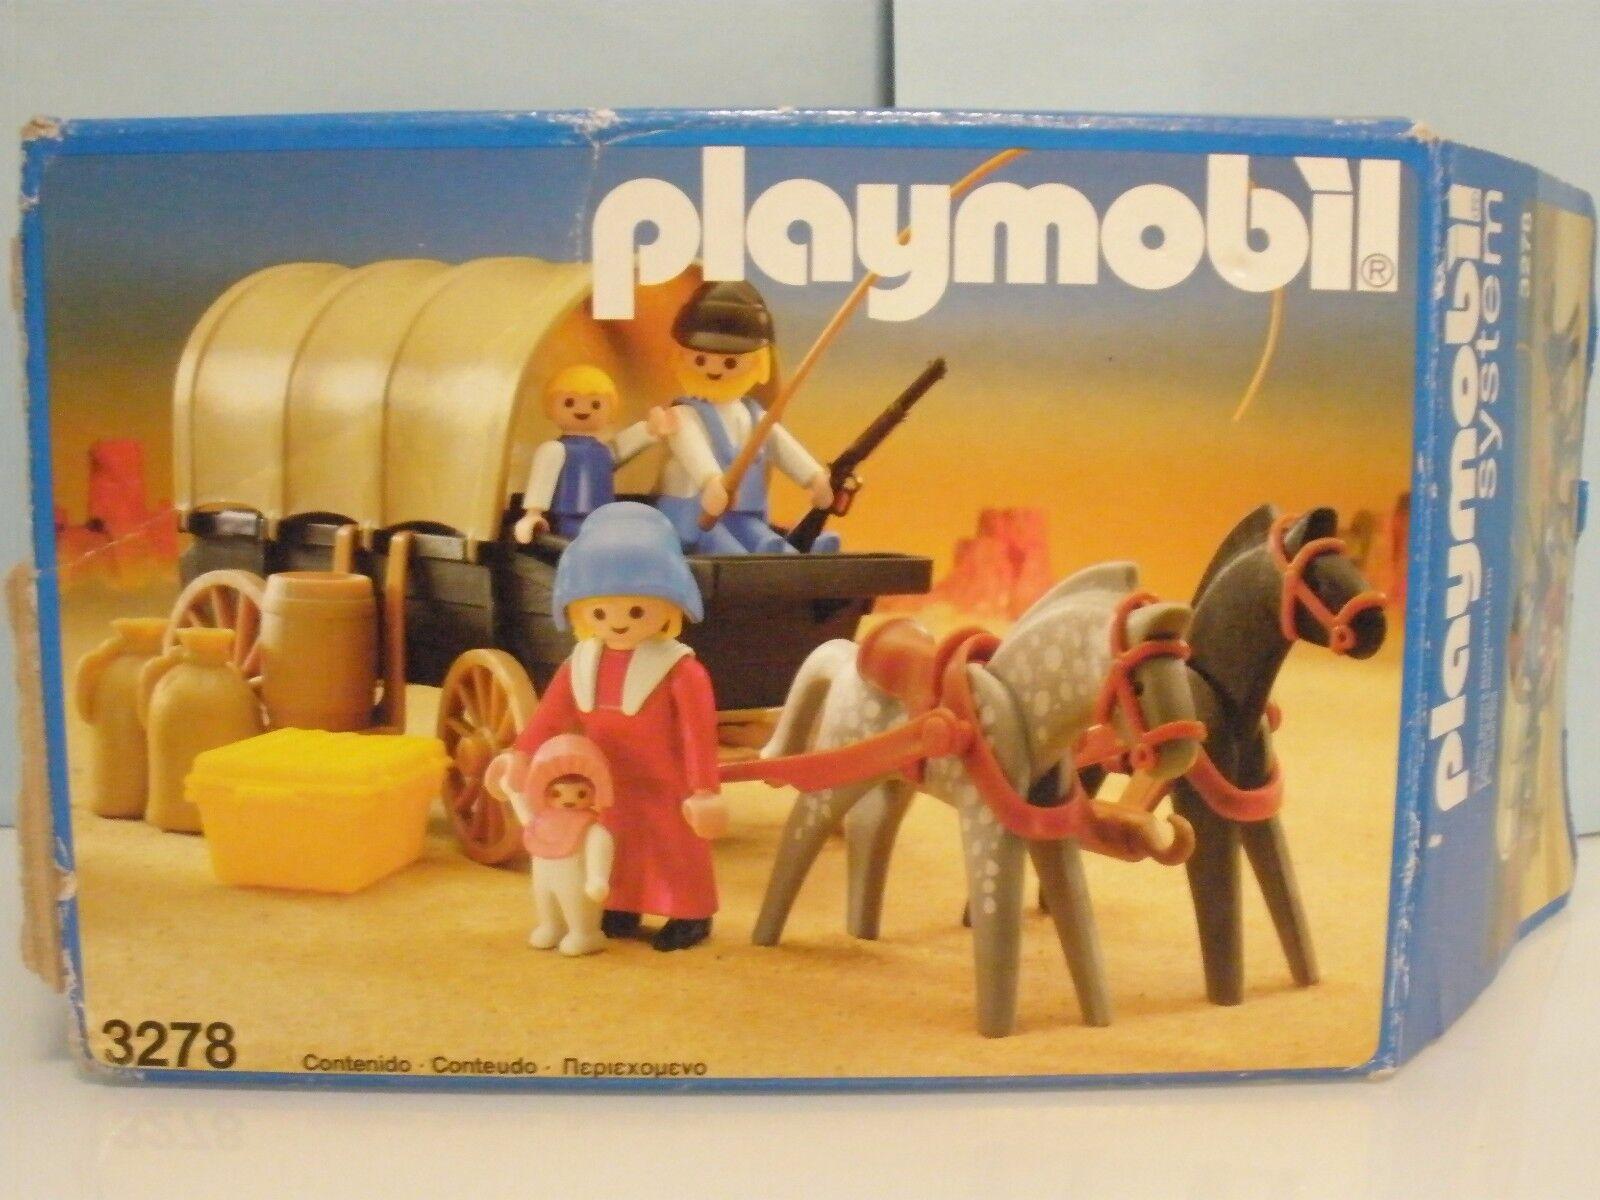 Playmobil Western Carromato Carreta del Oeste años 80  3278 Caja Original 4